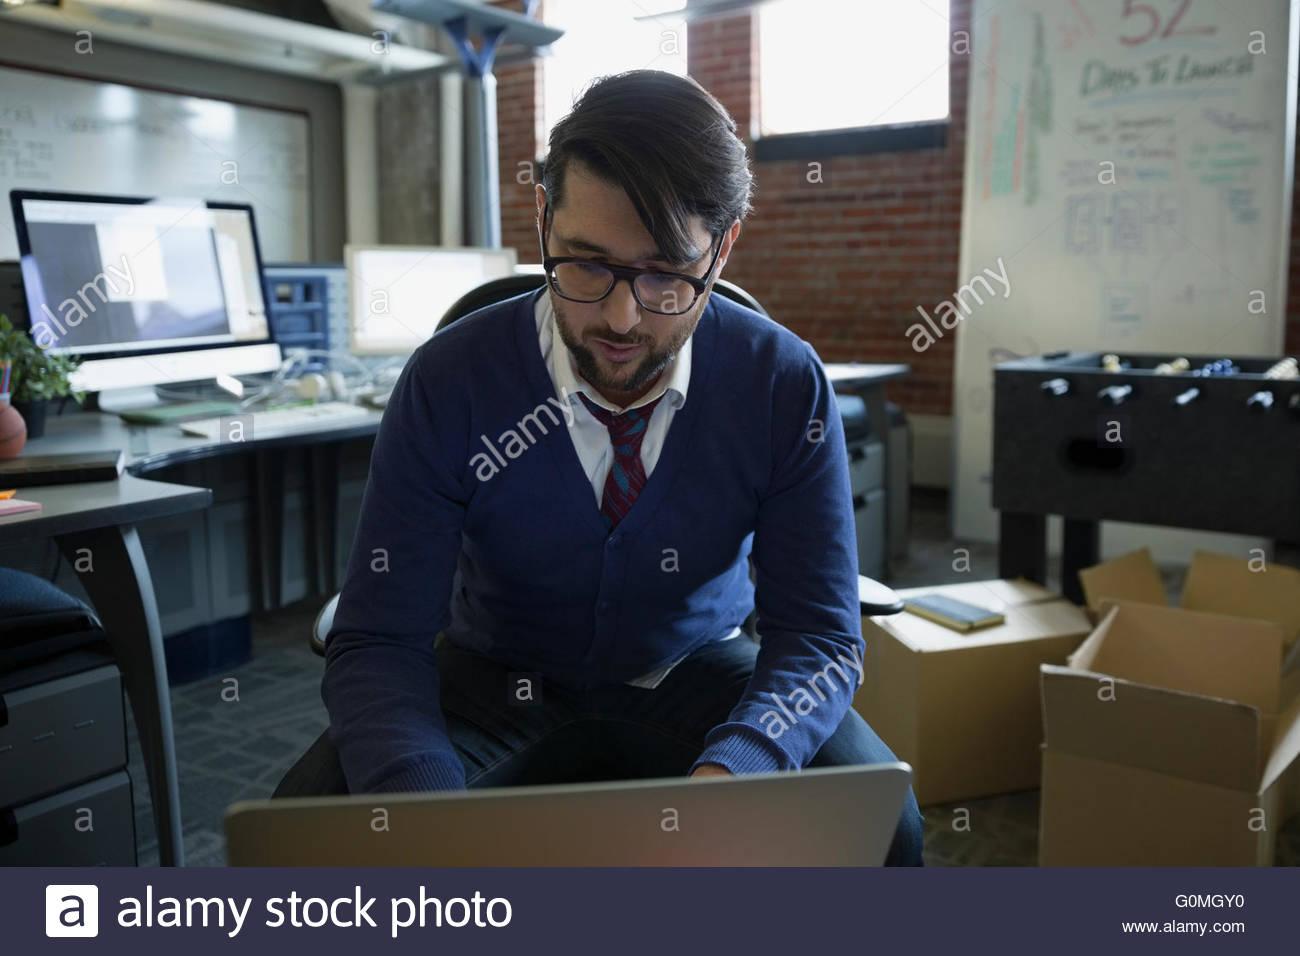 Entrepreneur using laptop in new office - Stock Image